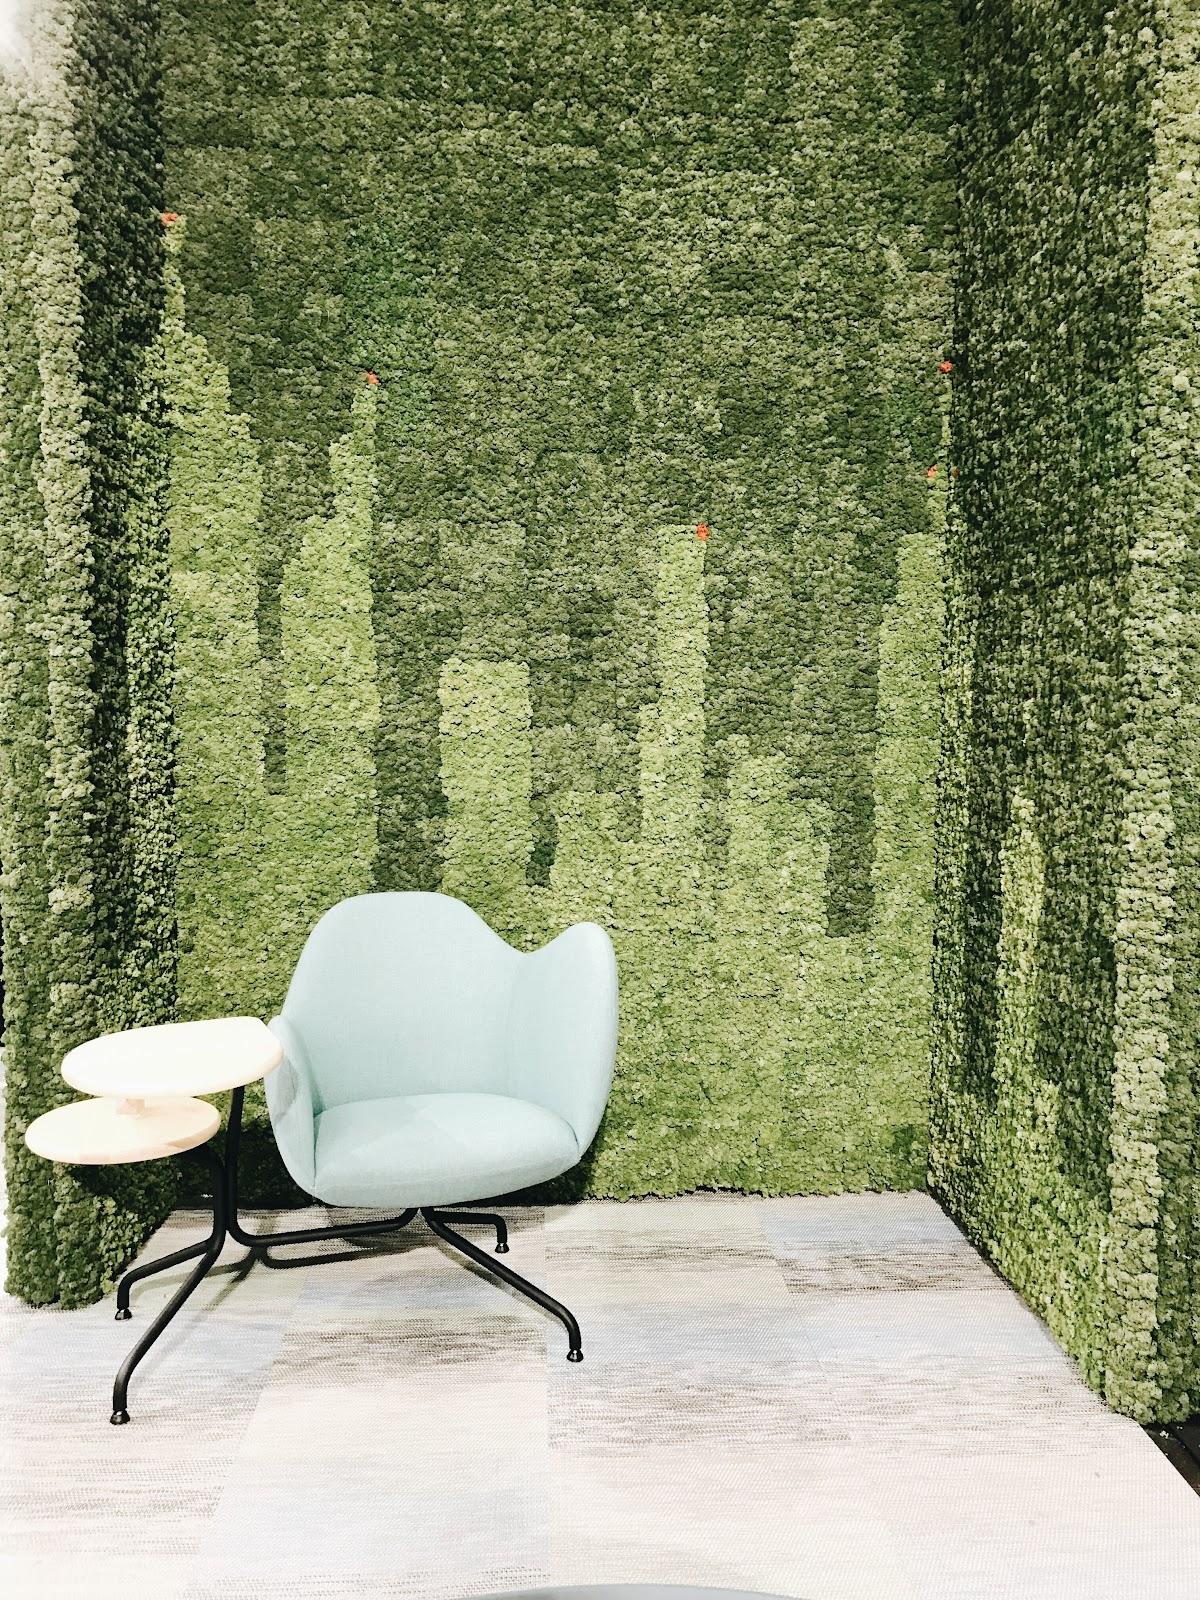 ICFF international contemporary design furniture fair texture cityscape